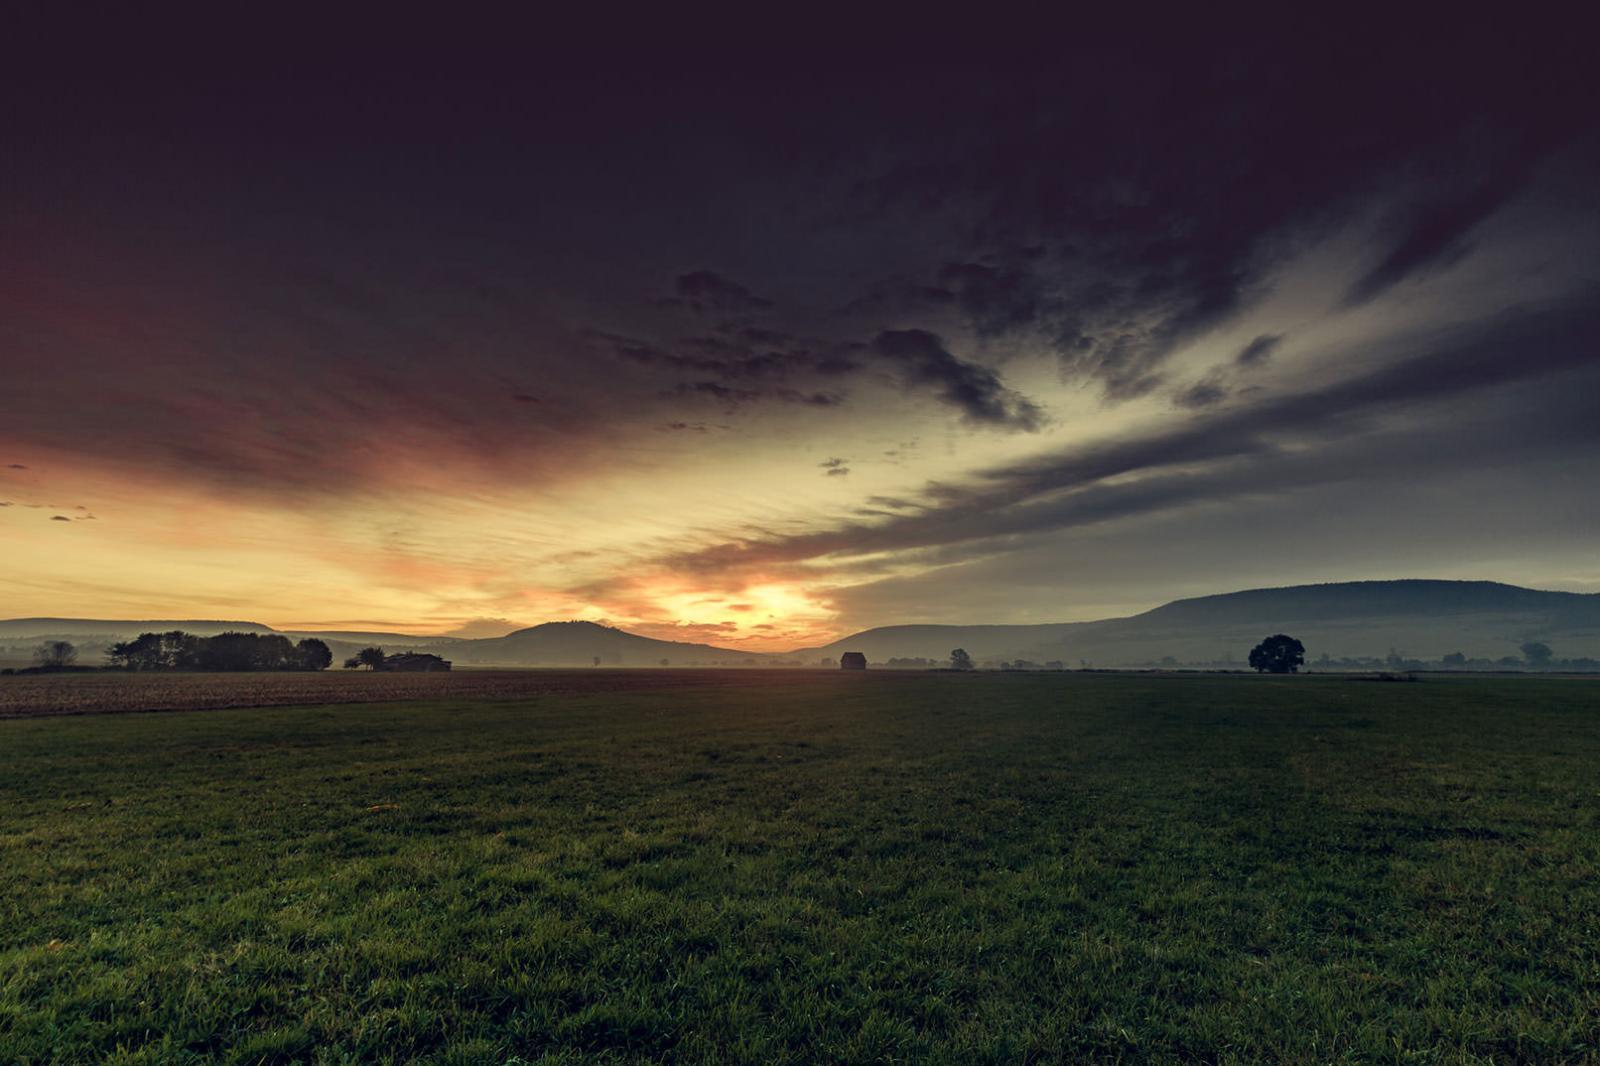 Herbst-Fotografie, Fotoshooting Landschaft und Himmel